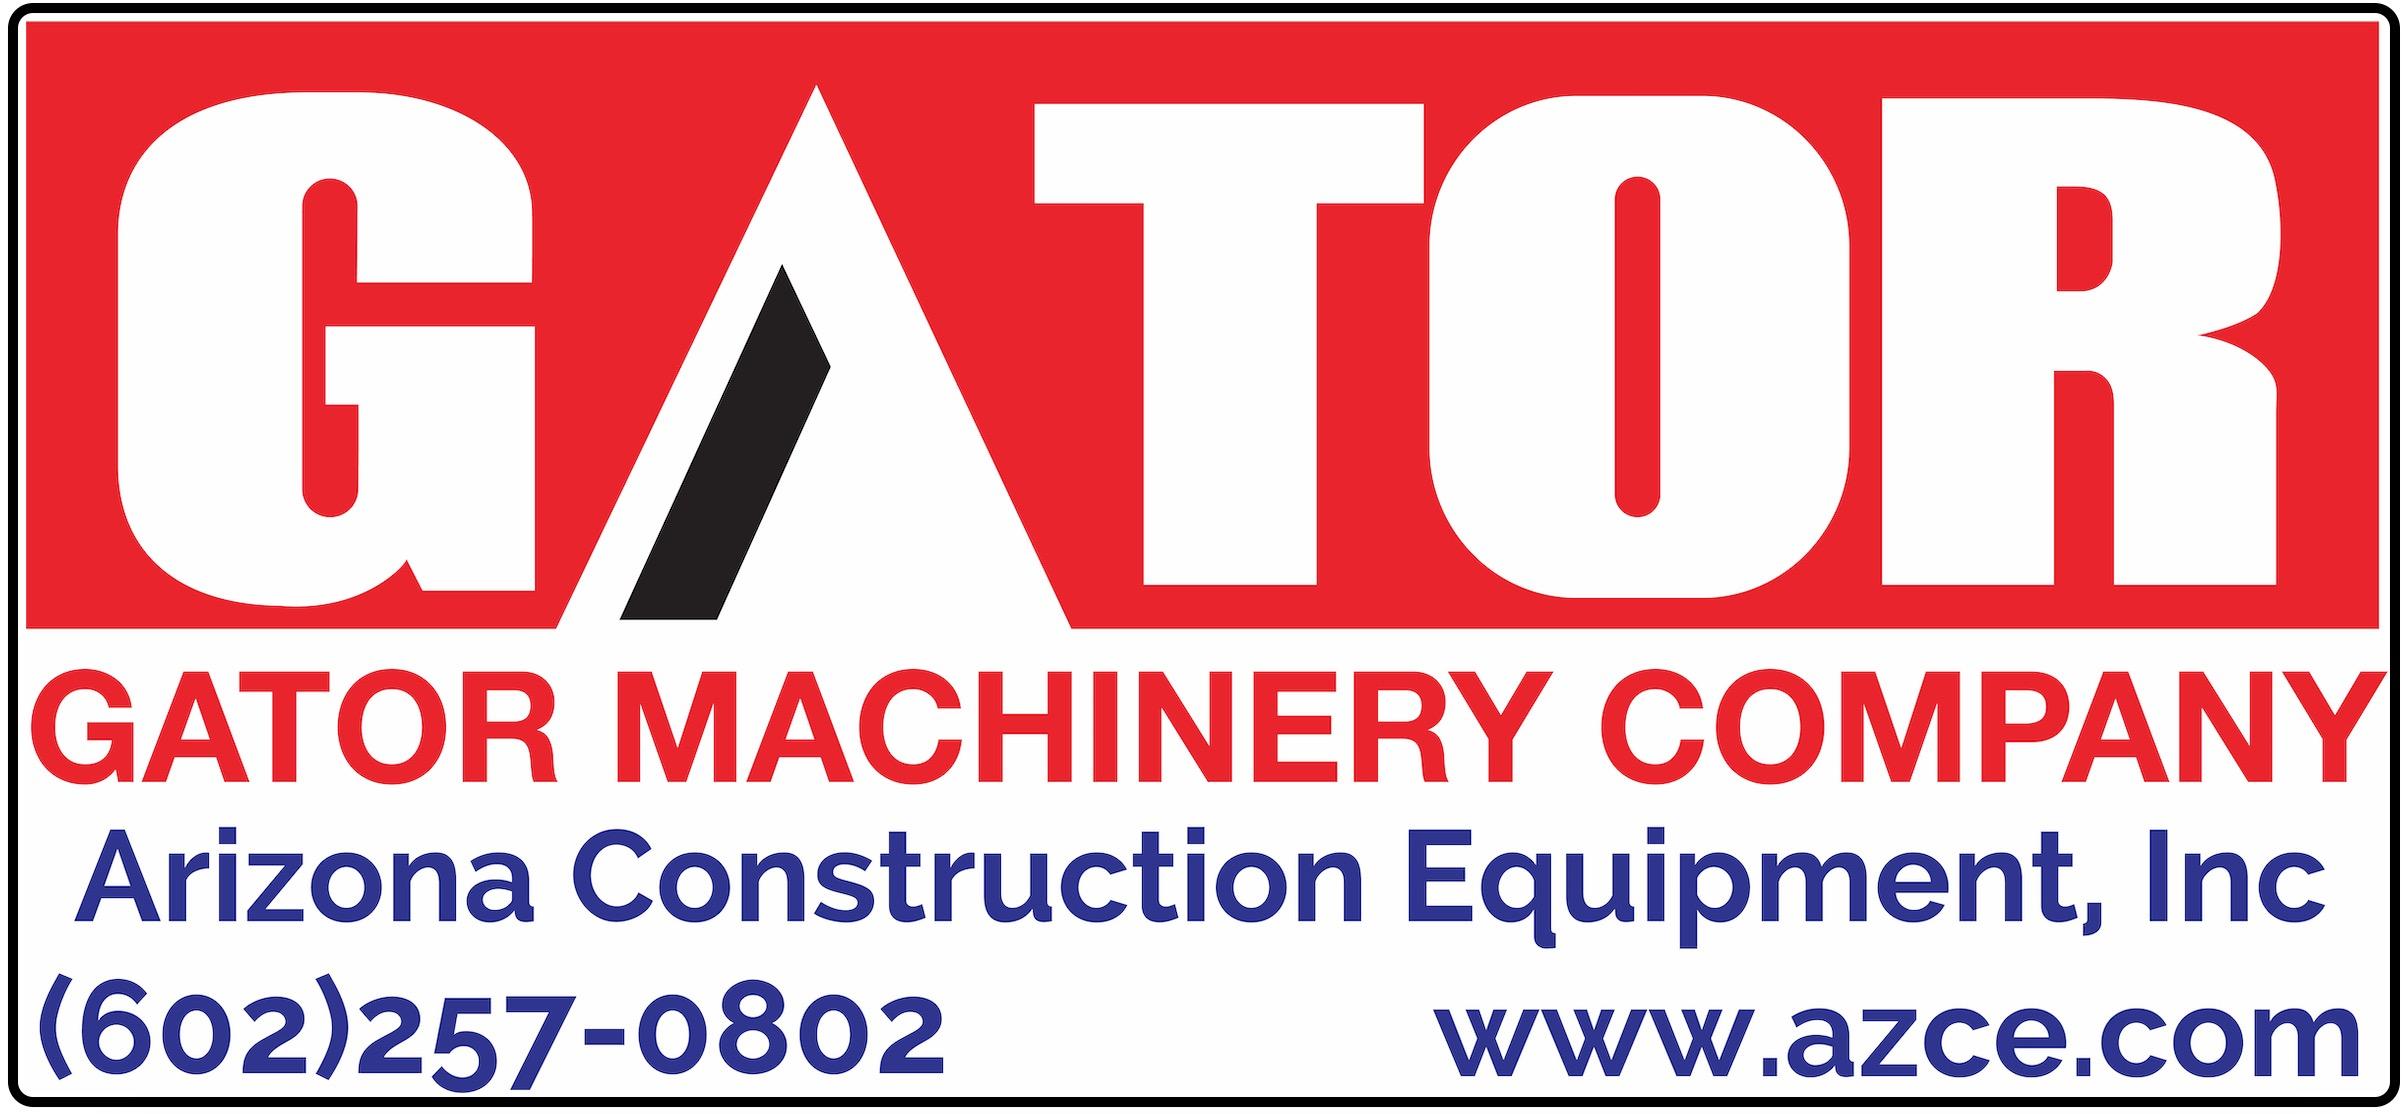 Gator Machinery Company and Arizona Construction Equipment, Inc.